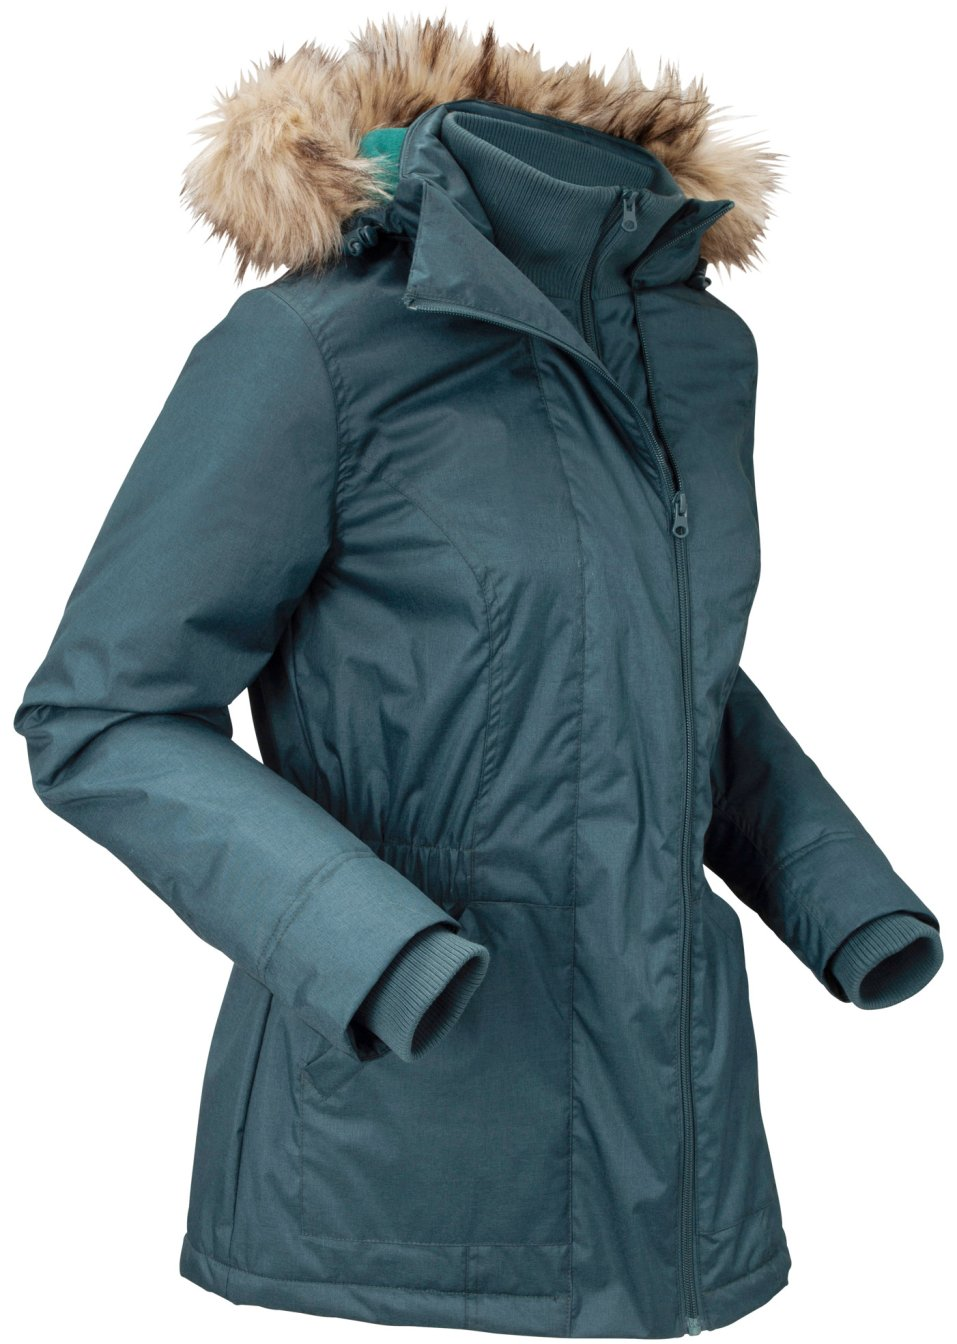 Alltagstaugliche Funktions-Jacke mit abnehmbarer Kapuze - petrolgrün meliert bdX9g BrDIu